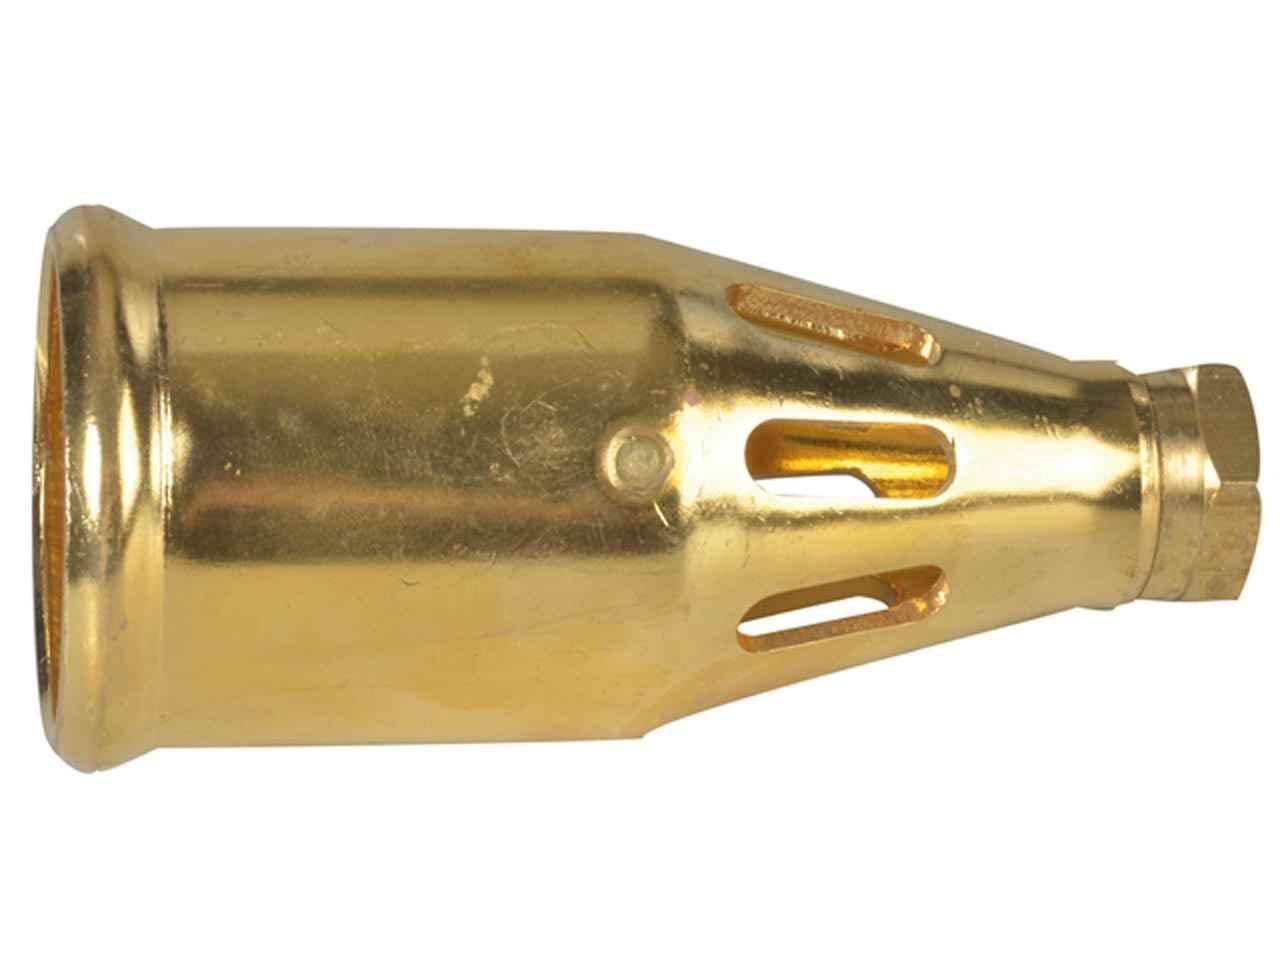 PRMS2944.JPG